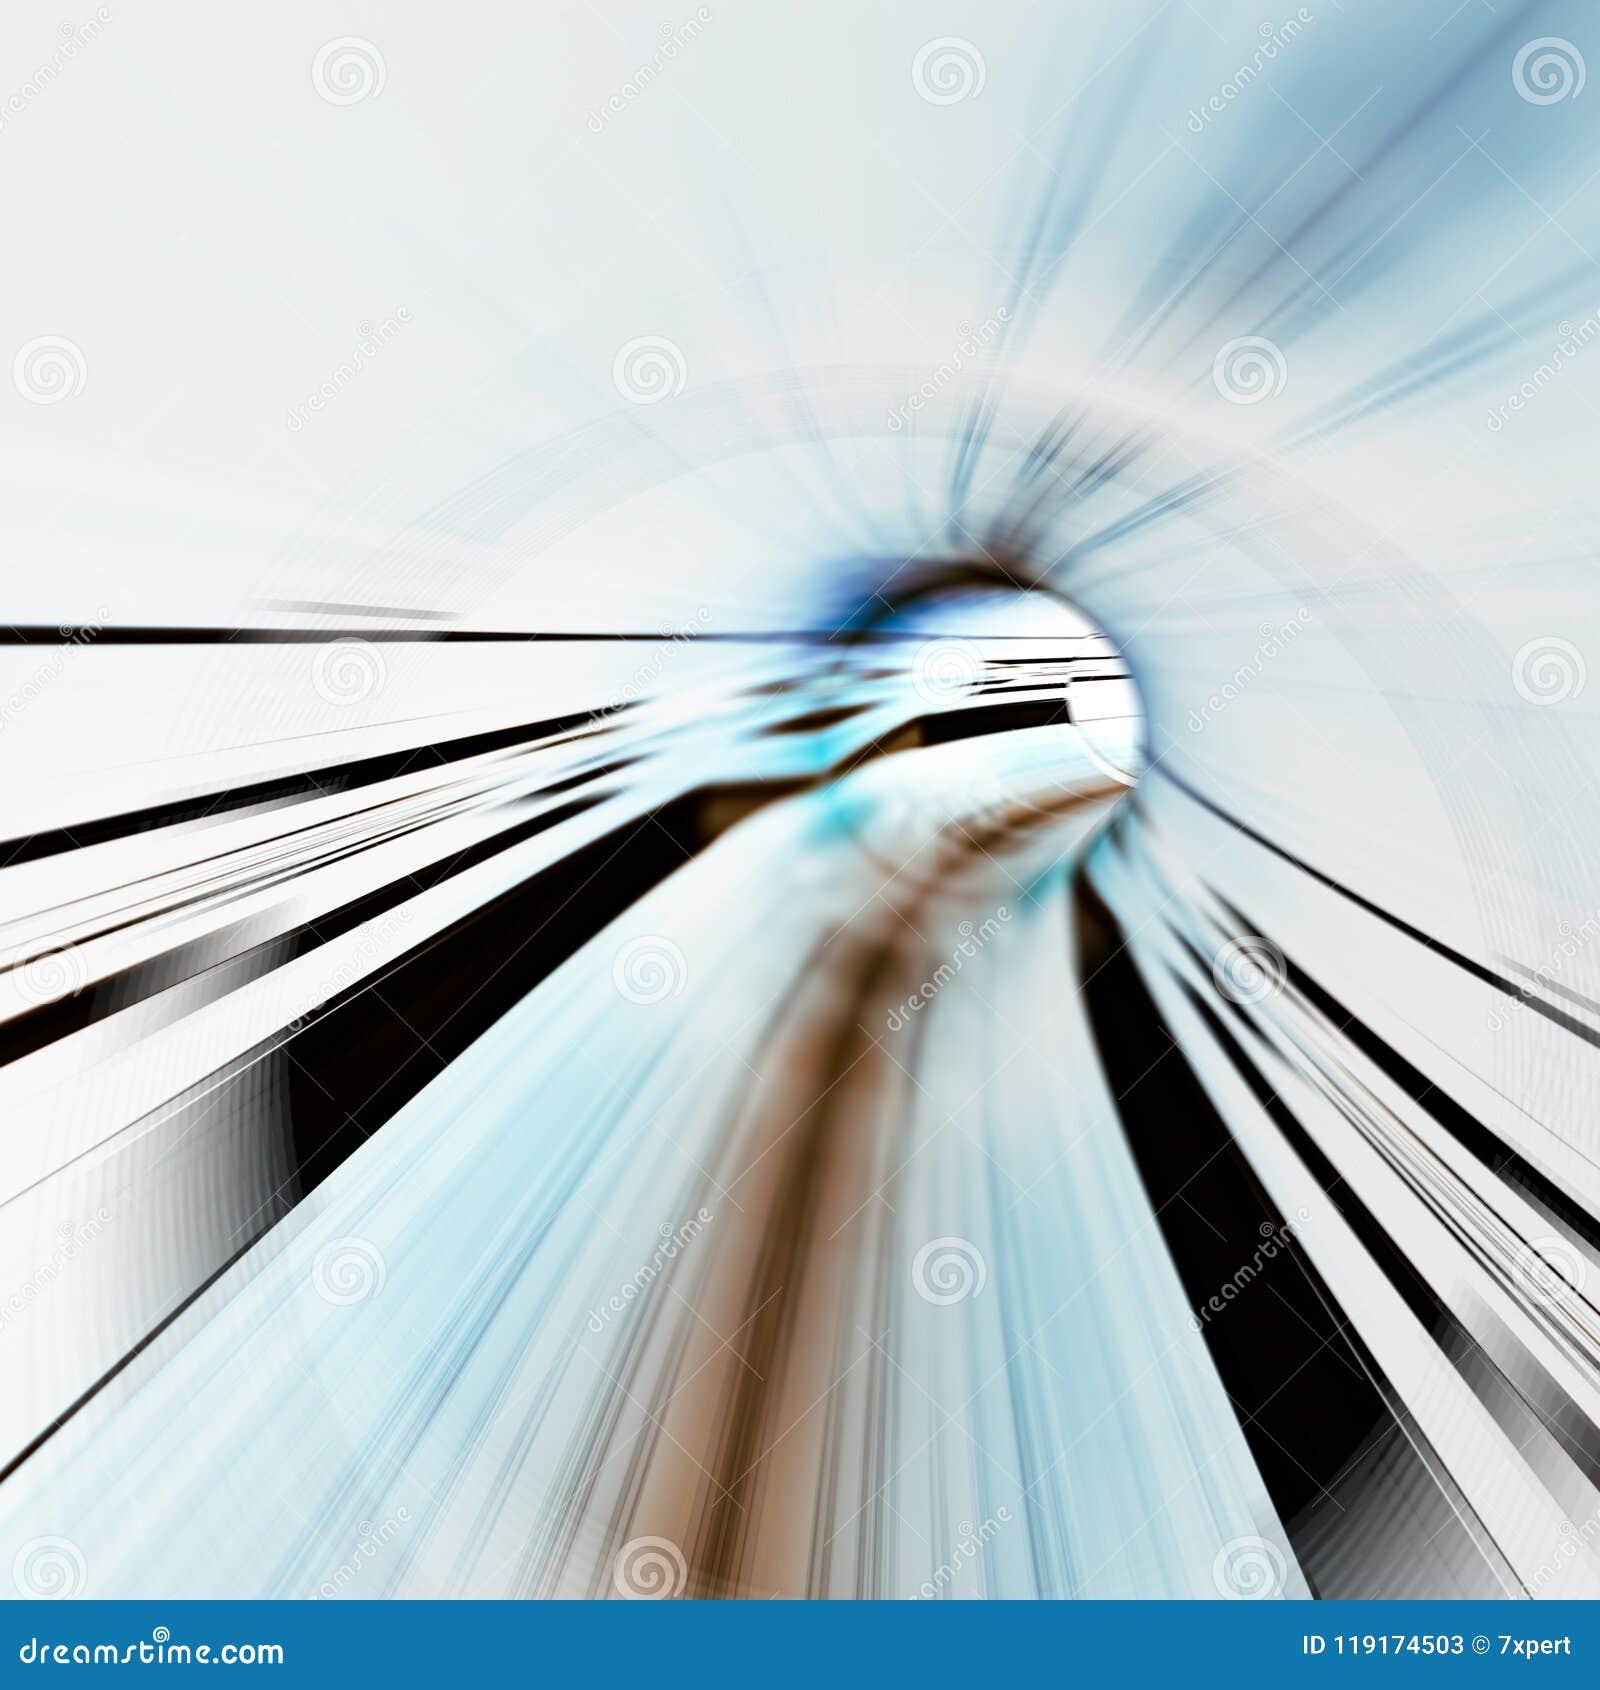 Speed lights effects